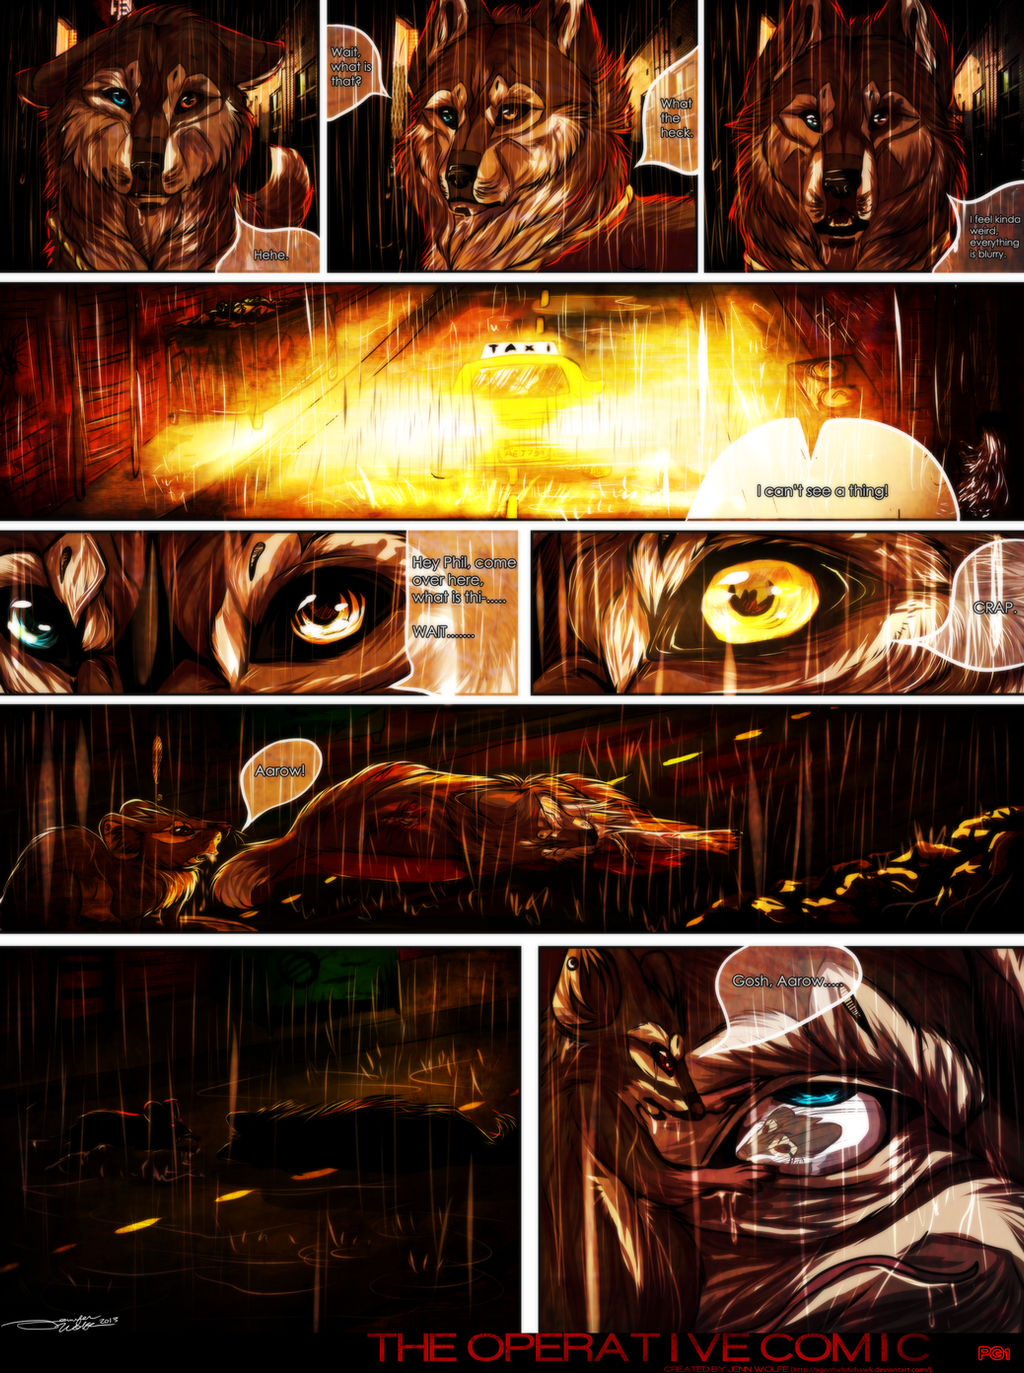 The Operative Page 1. by PricklyAlpaca